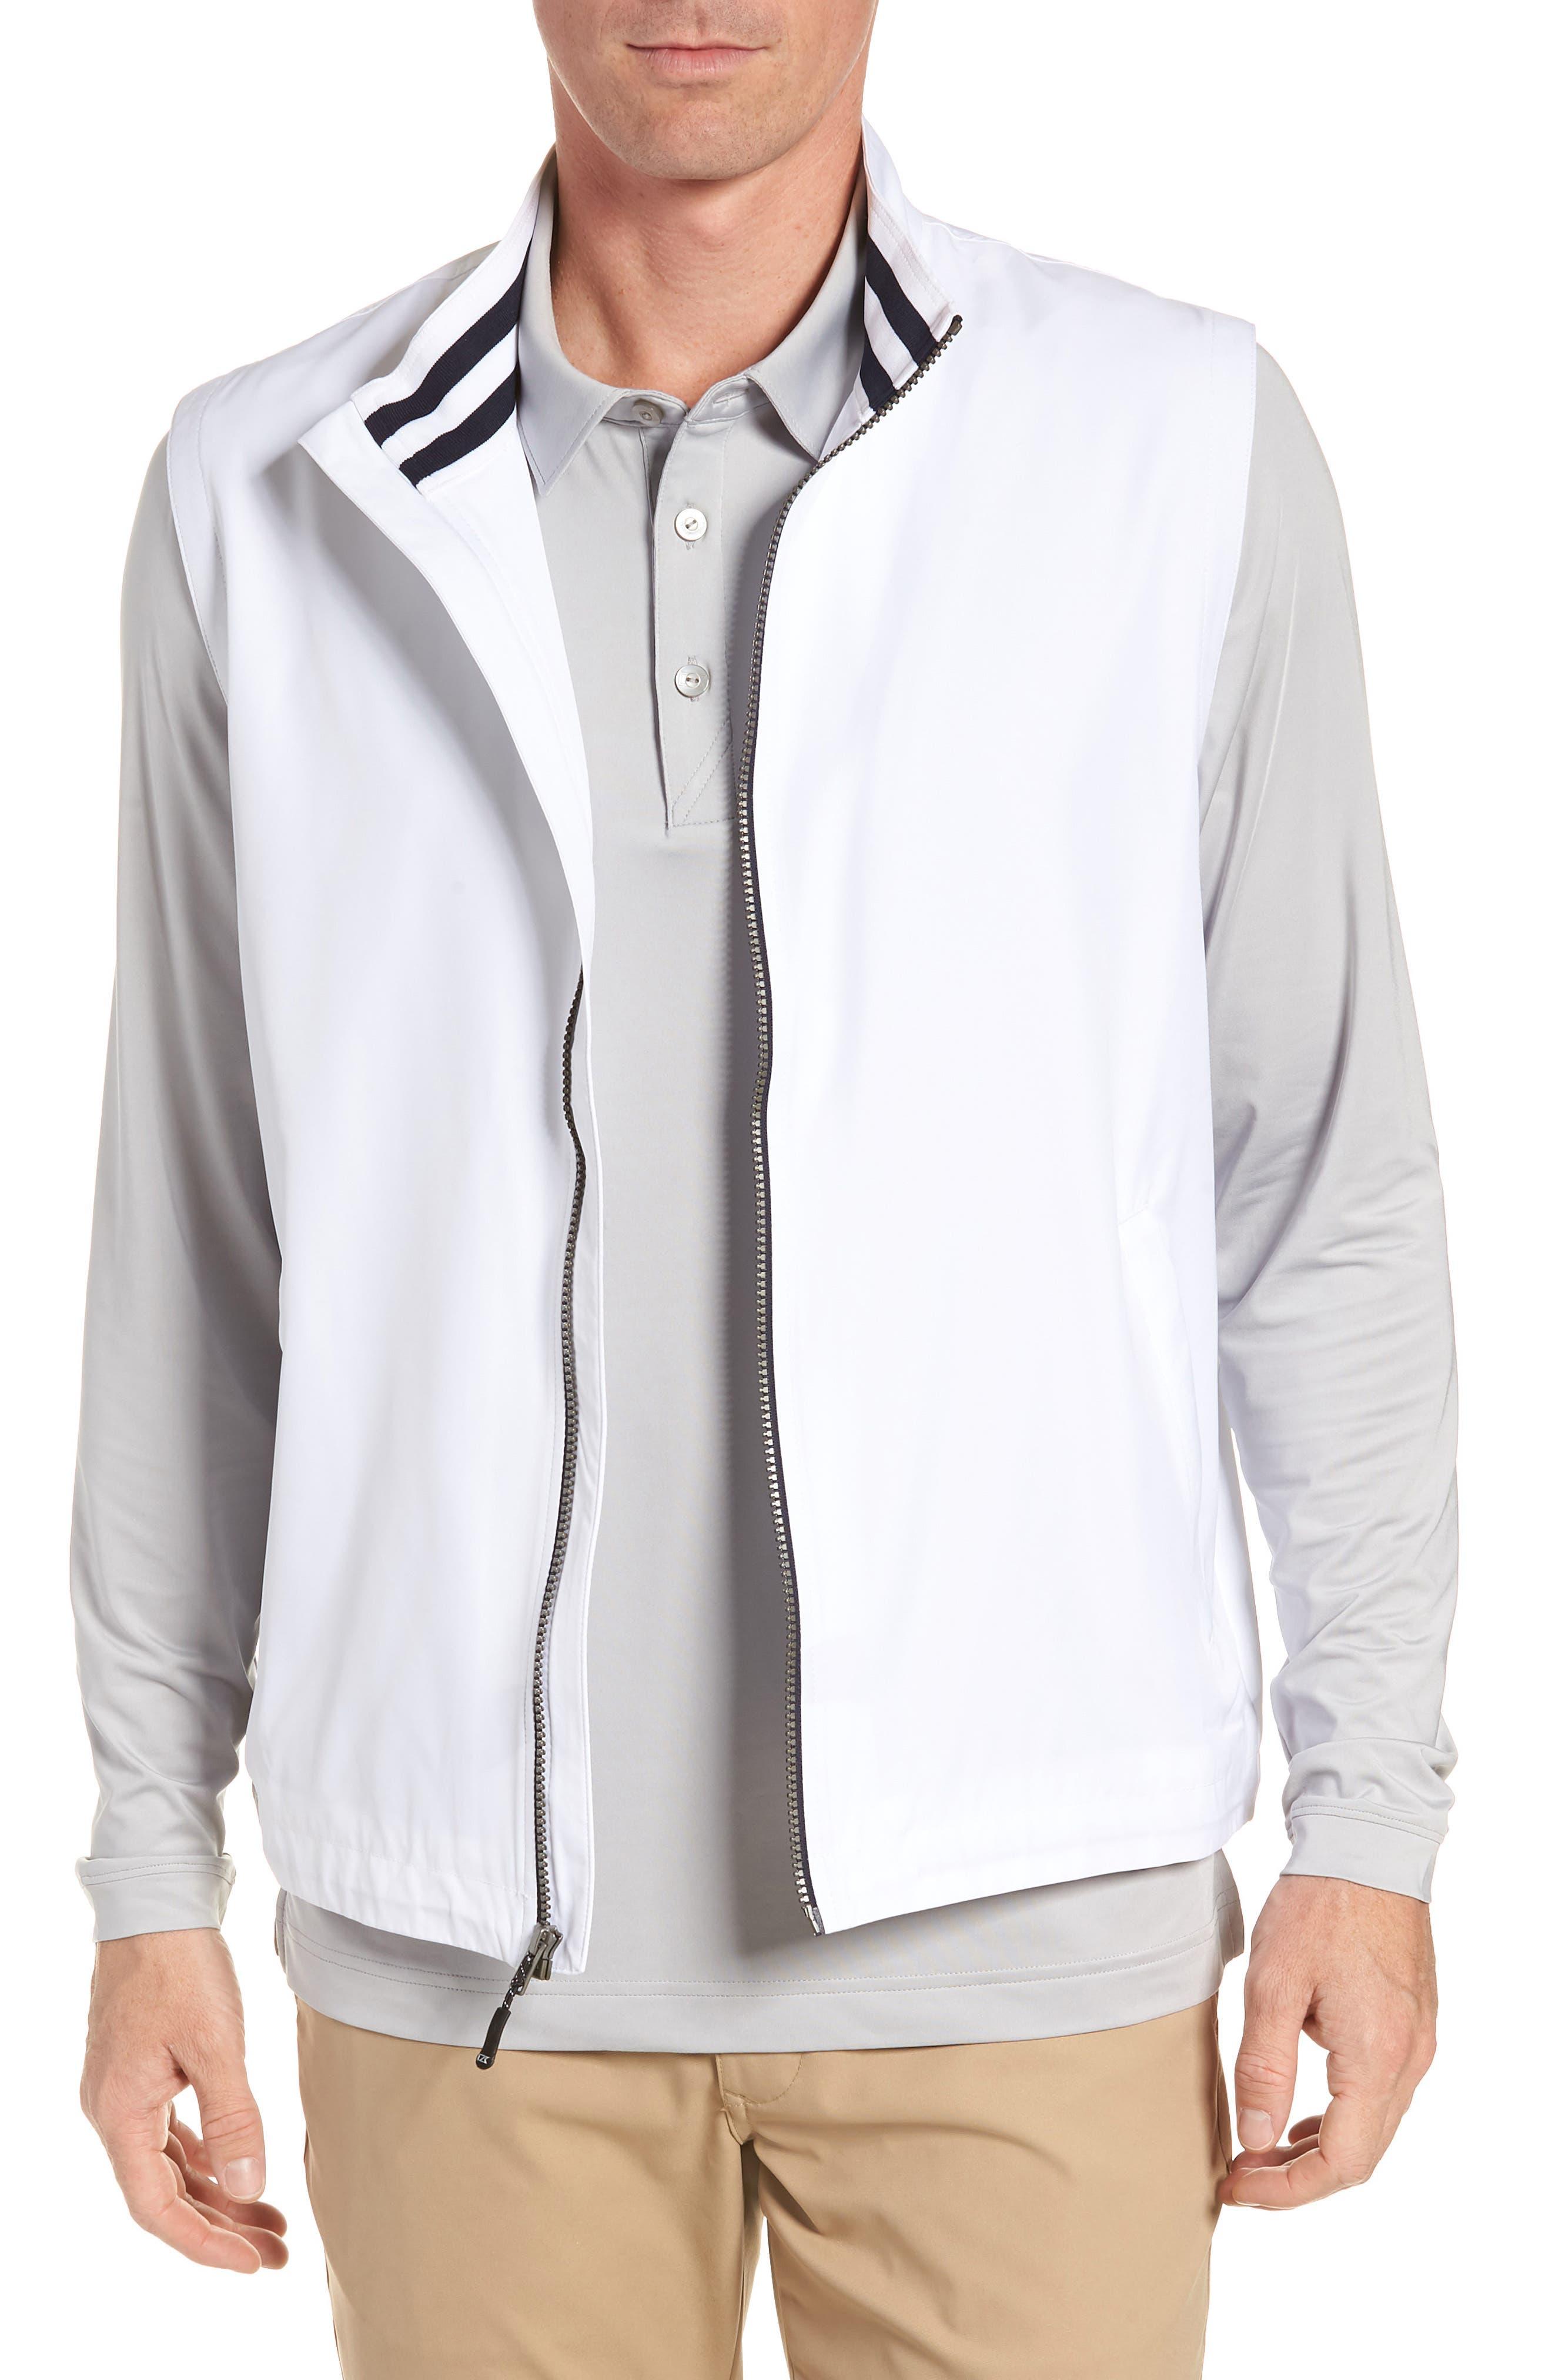 Cutter & Buck Nine Iron Drytec Zip Vest, White